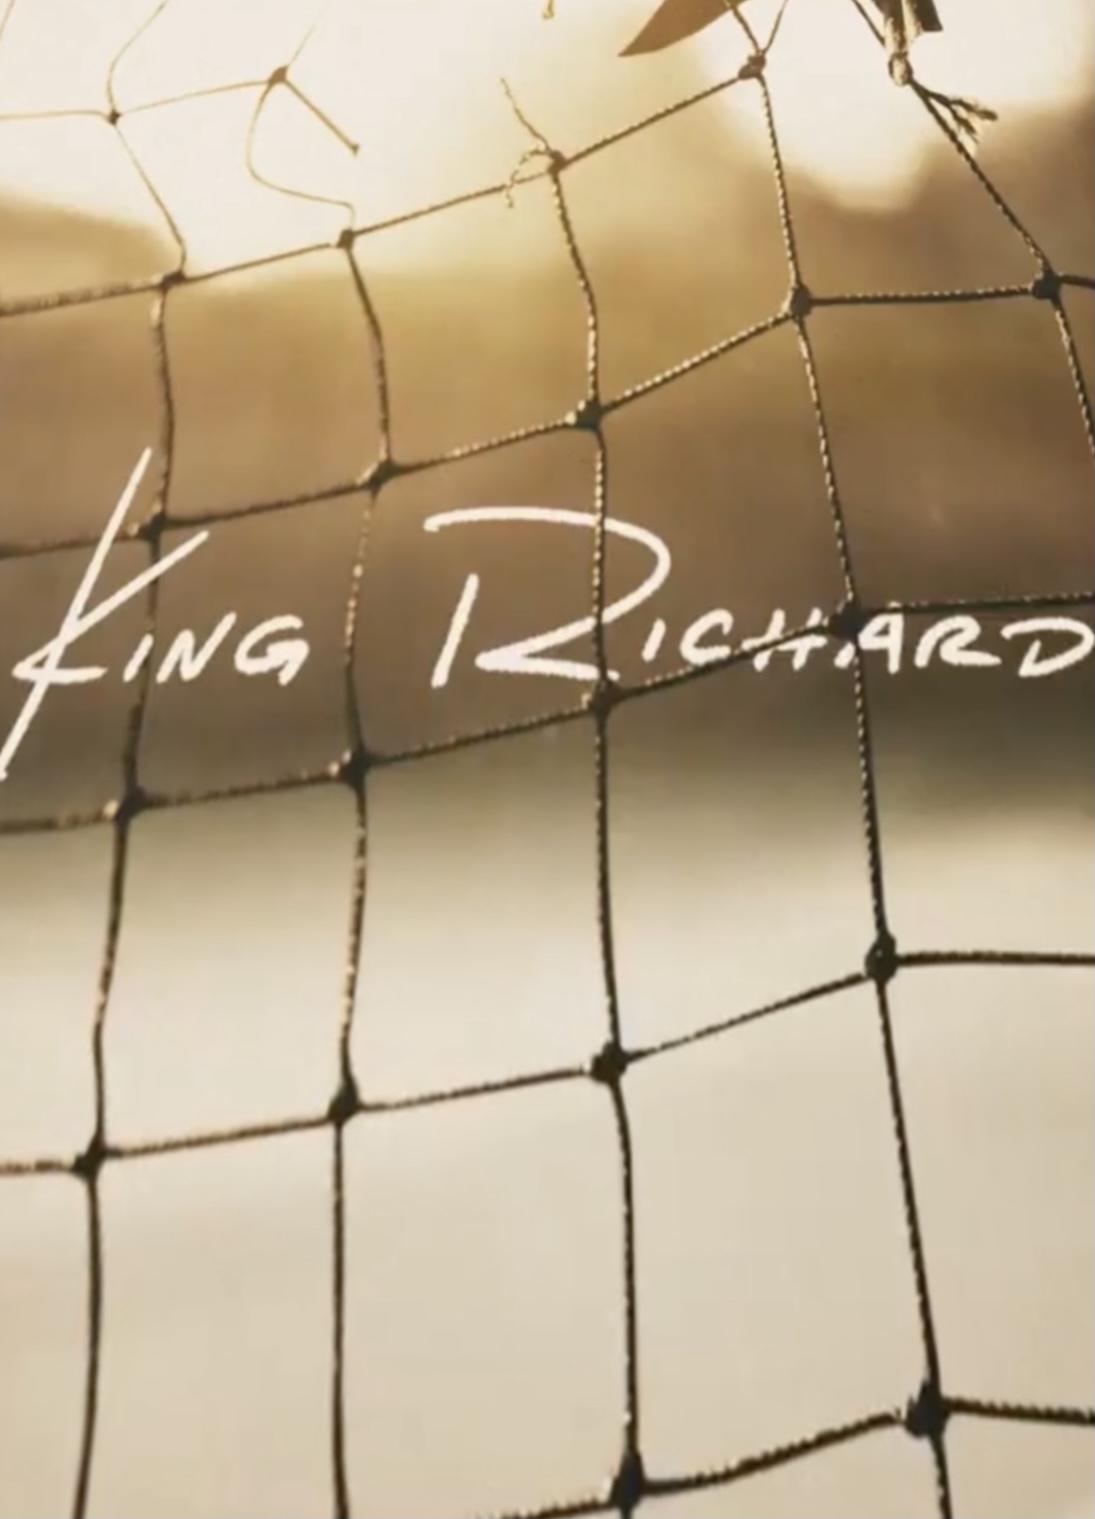 King Richard (2021) - IMDb